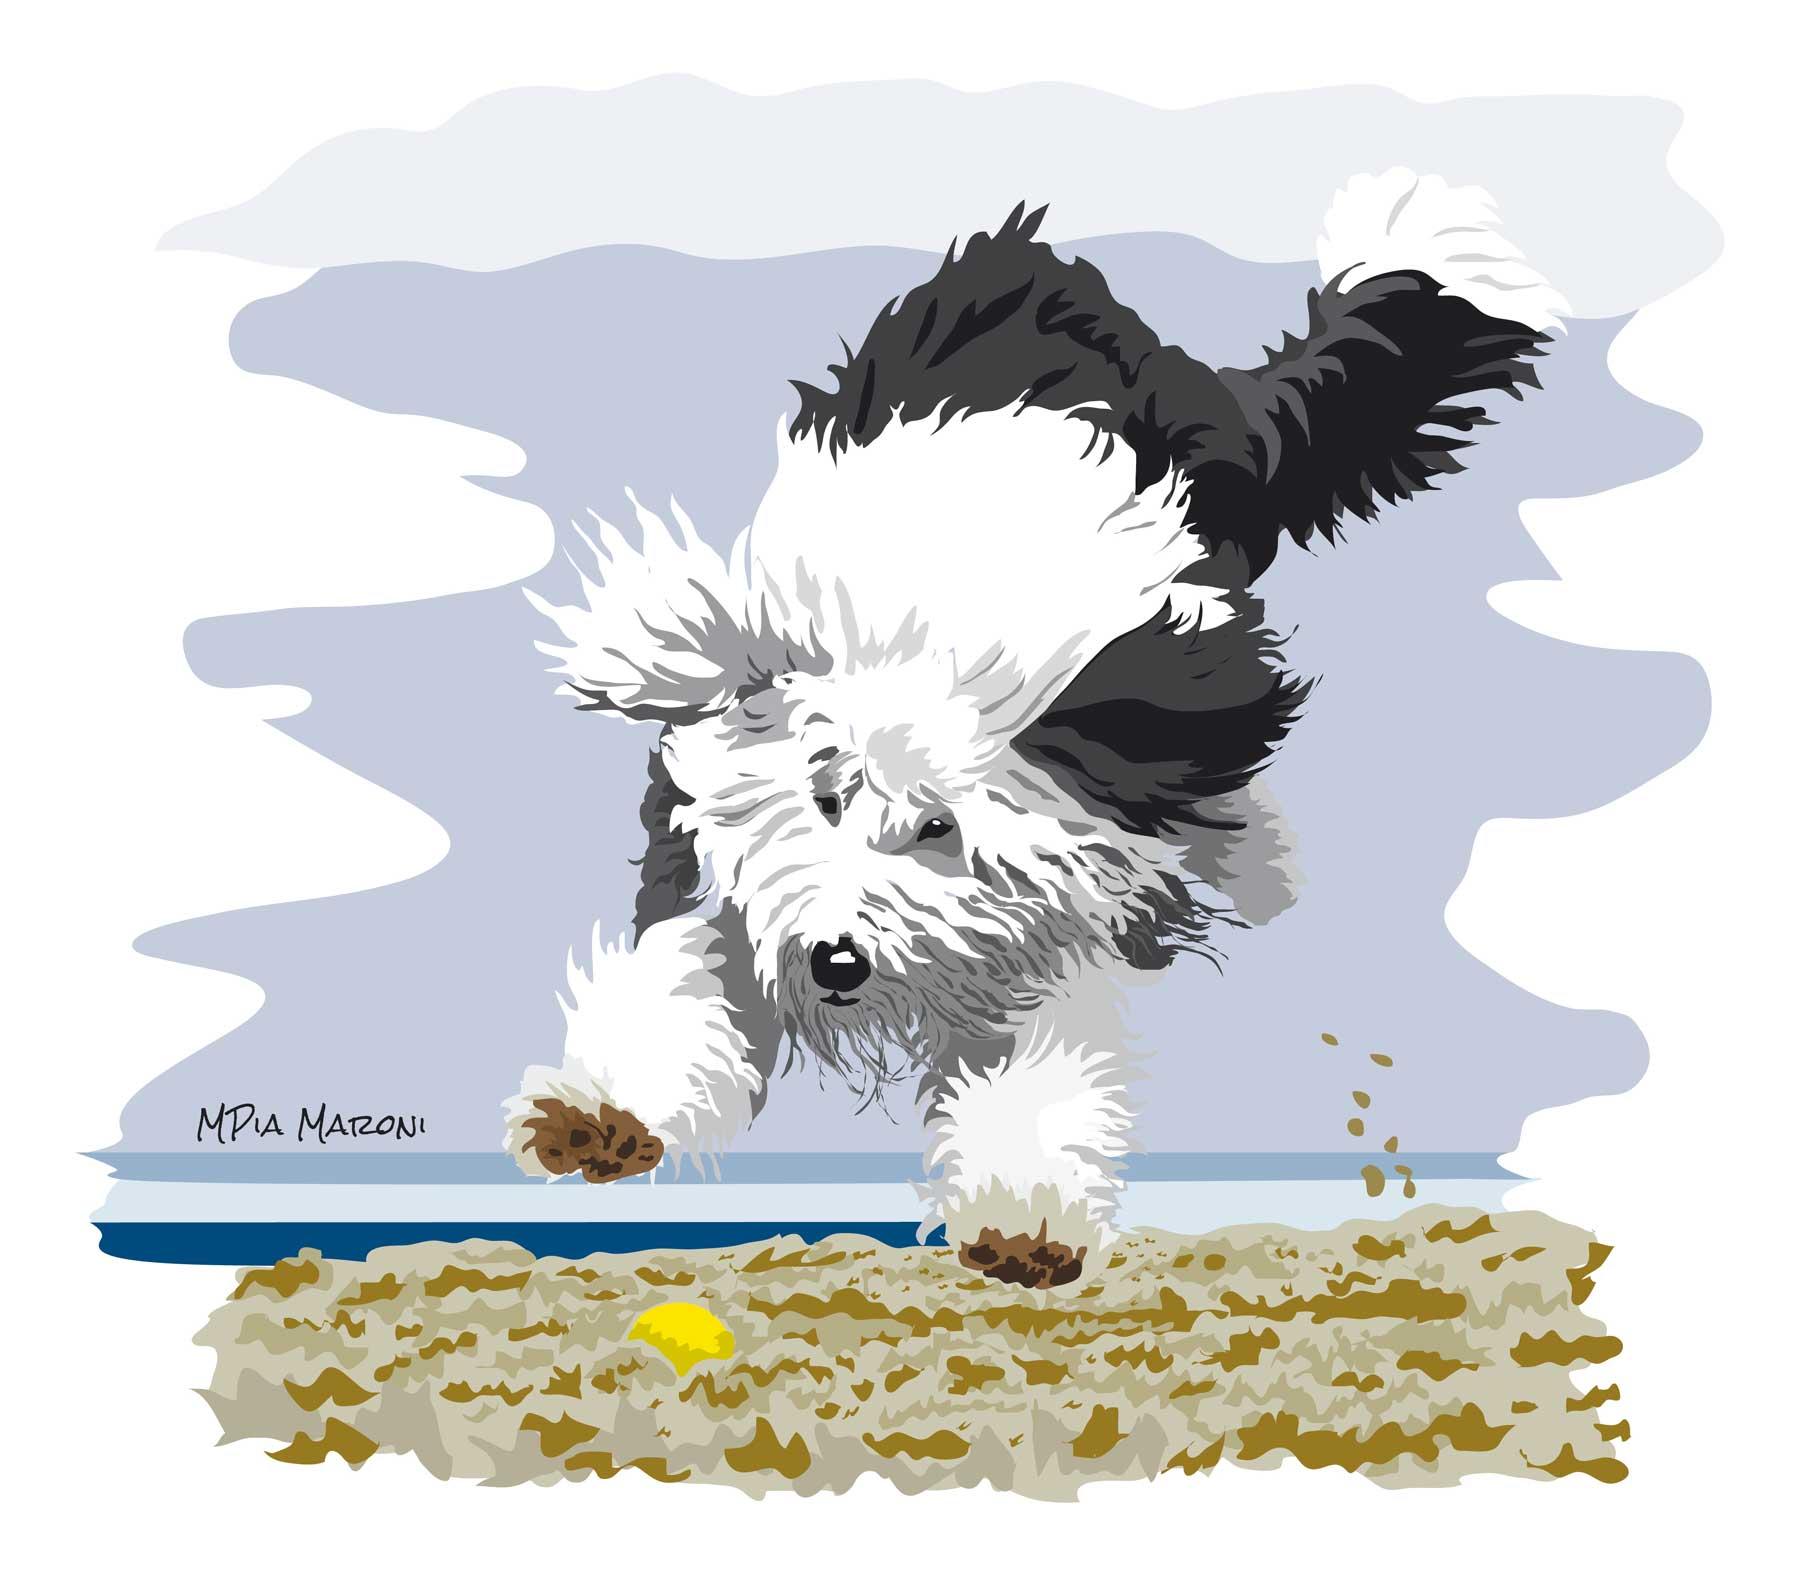 Bobtail salto nella spiaggia, foto Kati Alexander